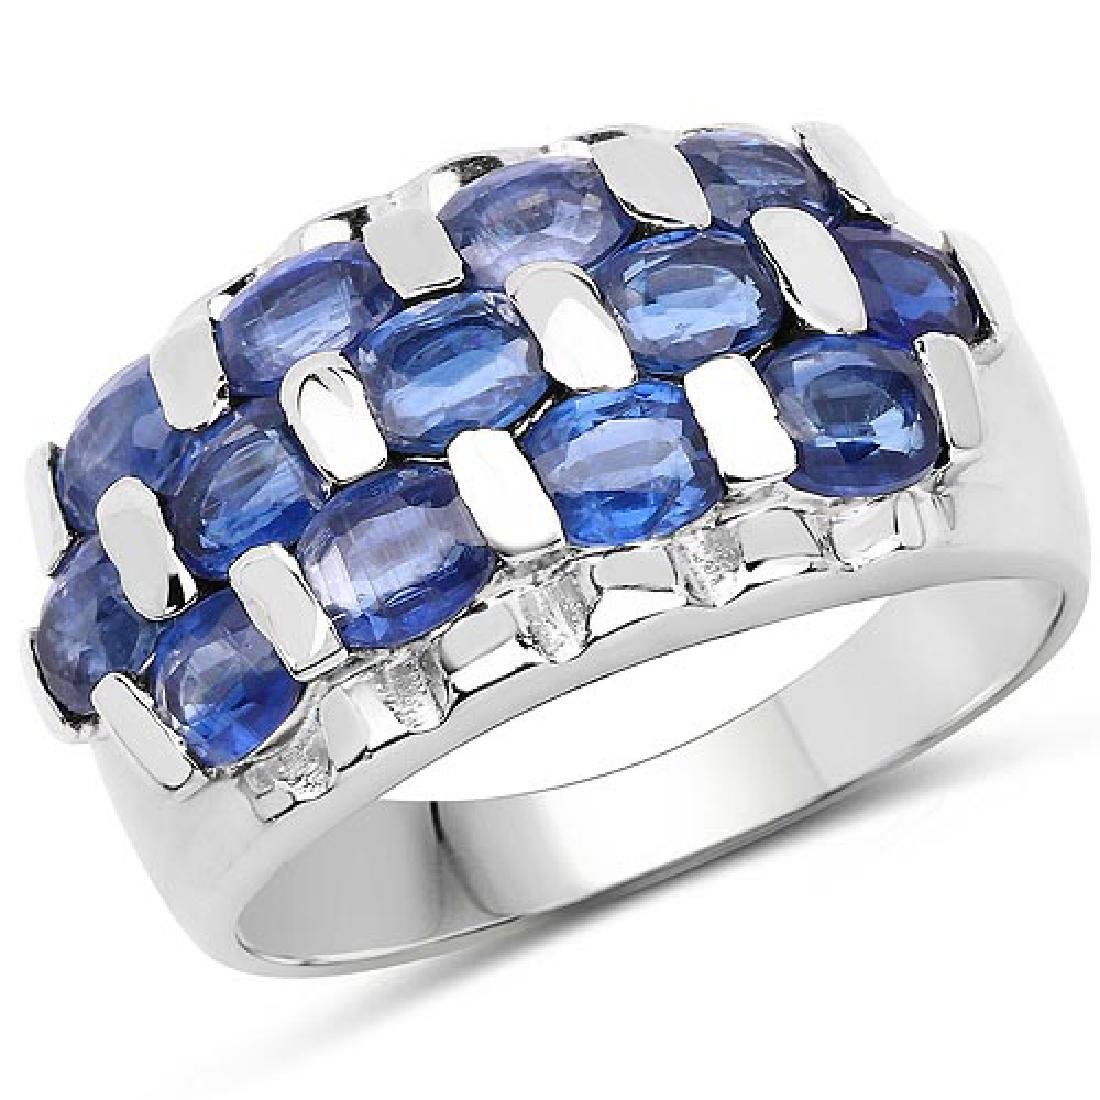 3.51 Carat Genuine Kyanite .925 Sterling Silver Ring